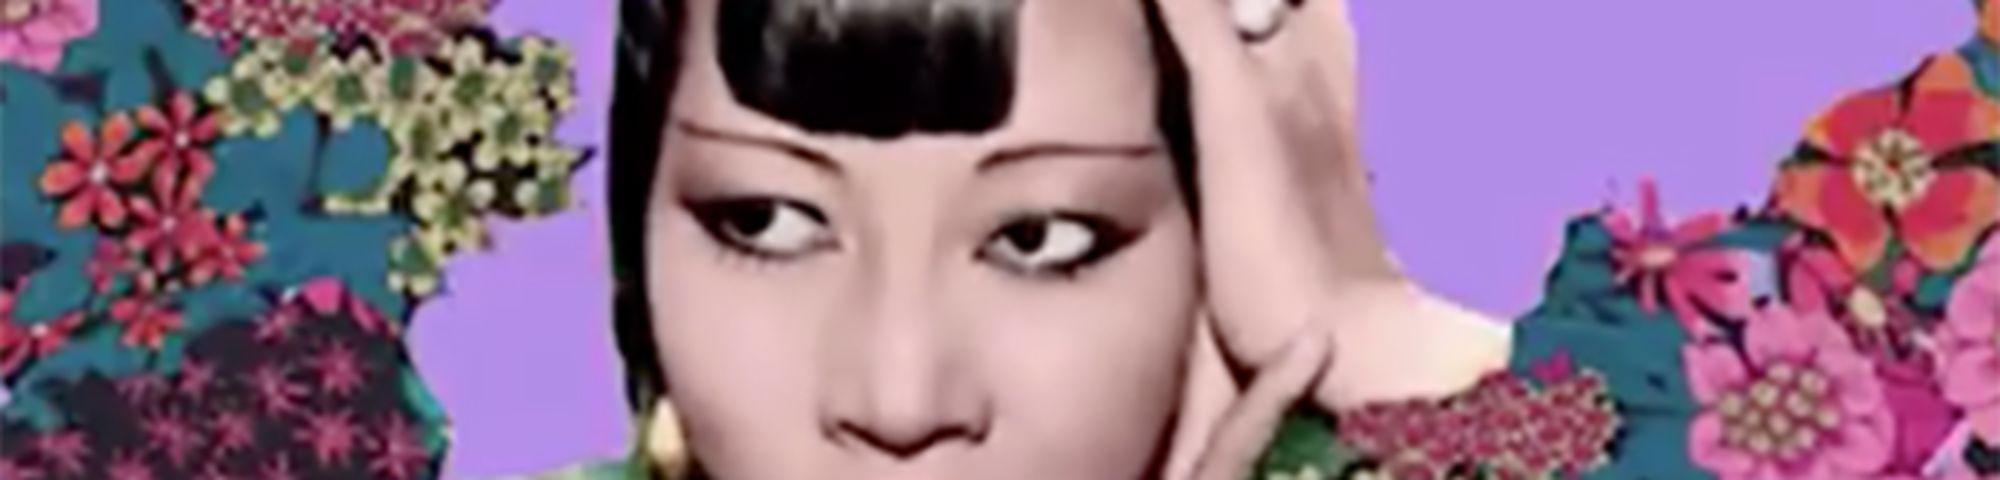 Anna Sui x Creative Direction for Fashion